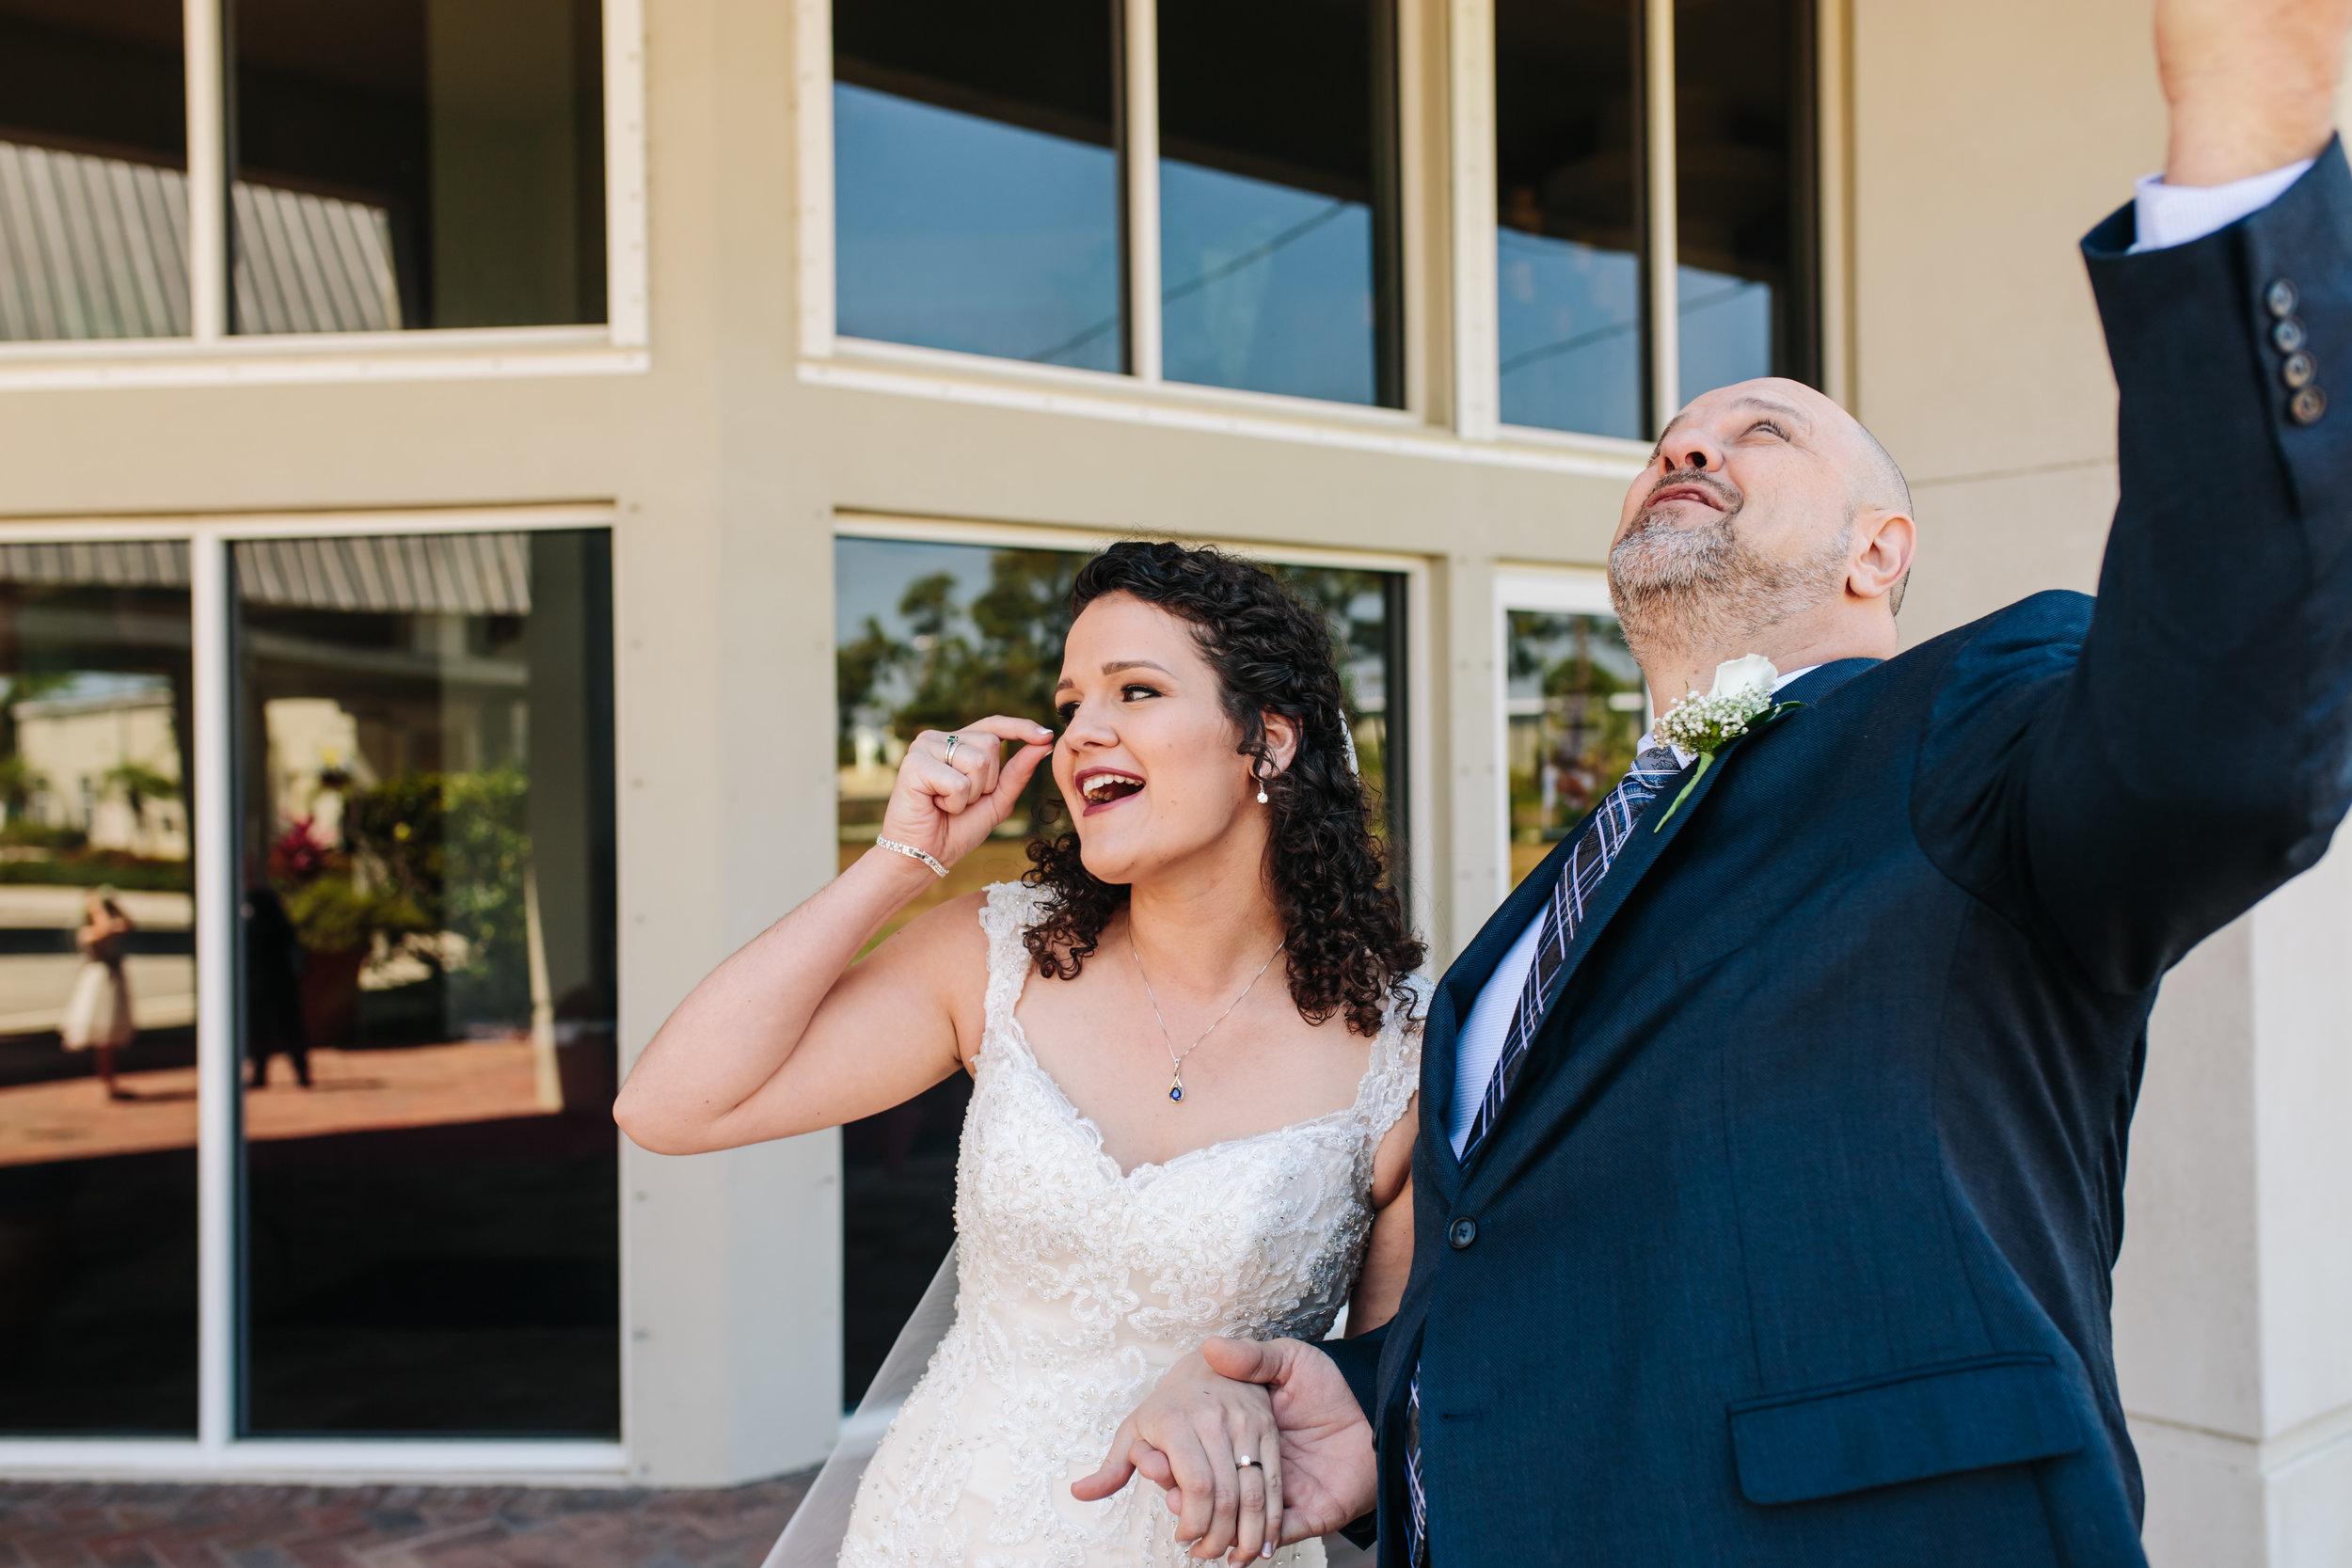 2018.03.17 Allison and Chuck Wedding Waelti Melbourne (88 of 900).jpg